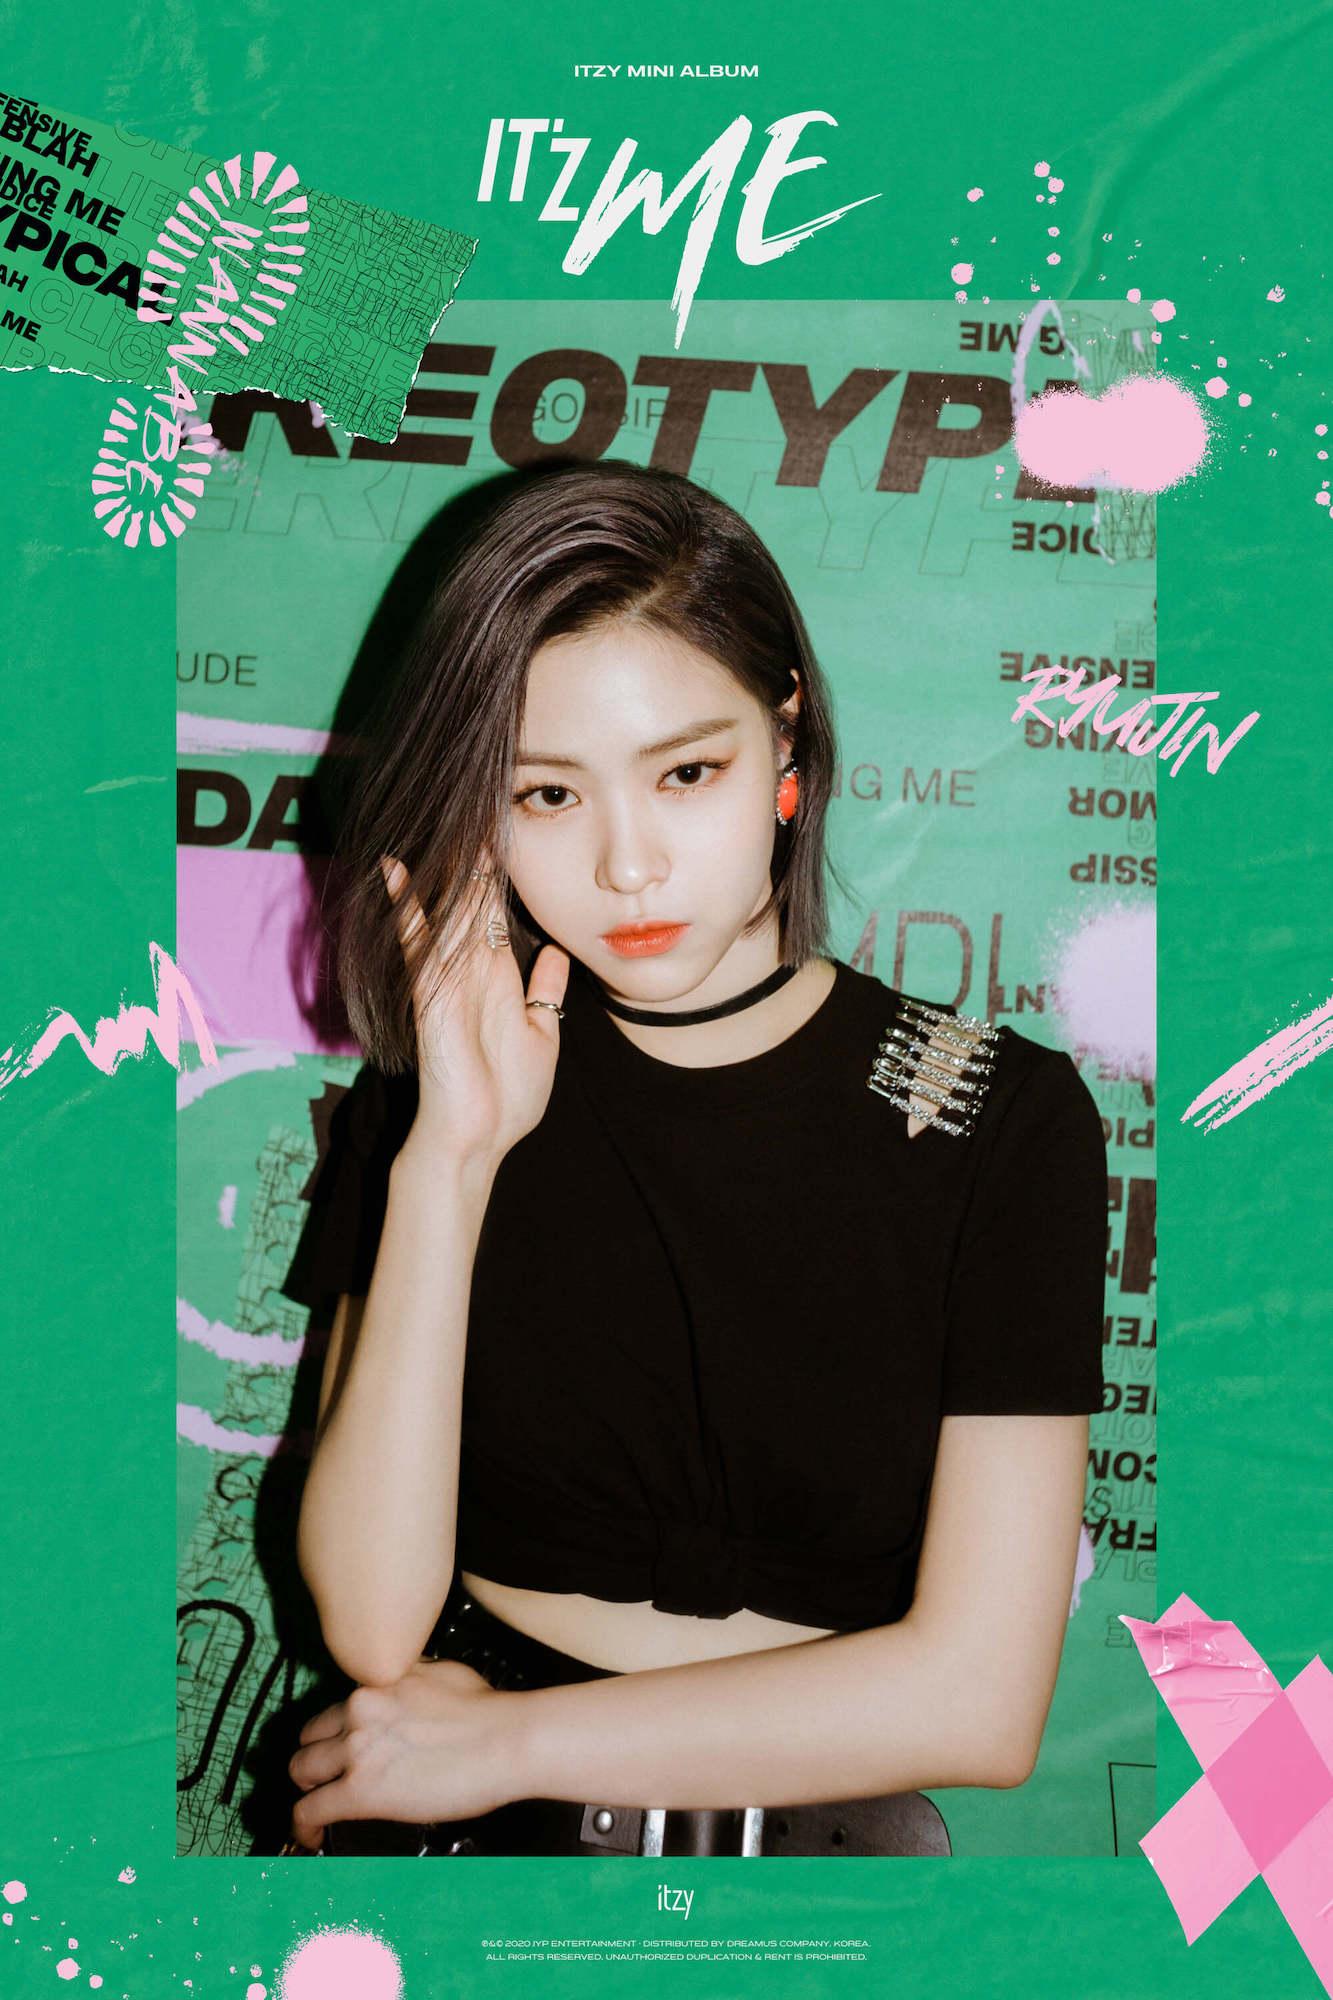 Ryujin profile image